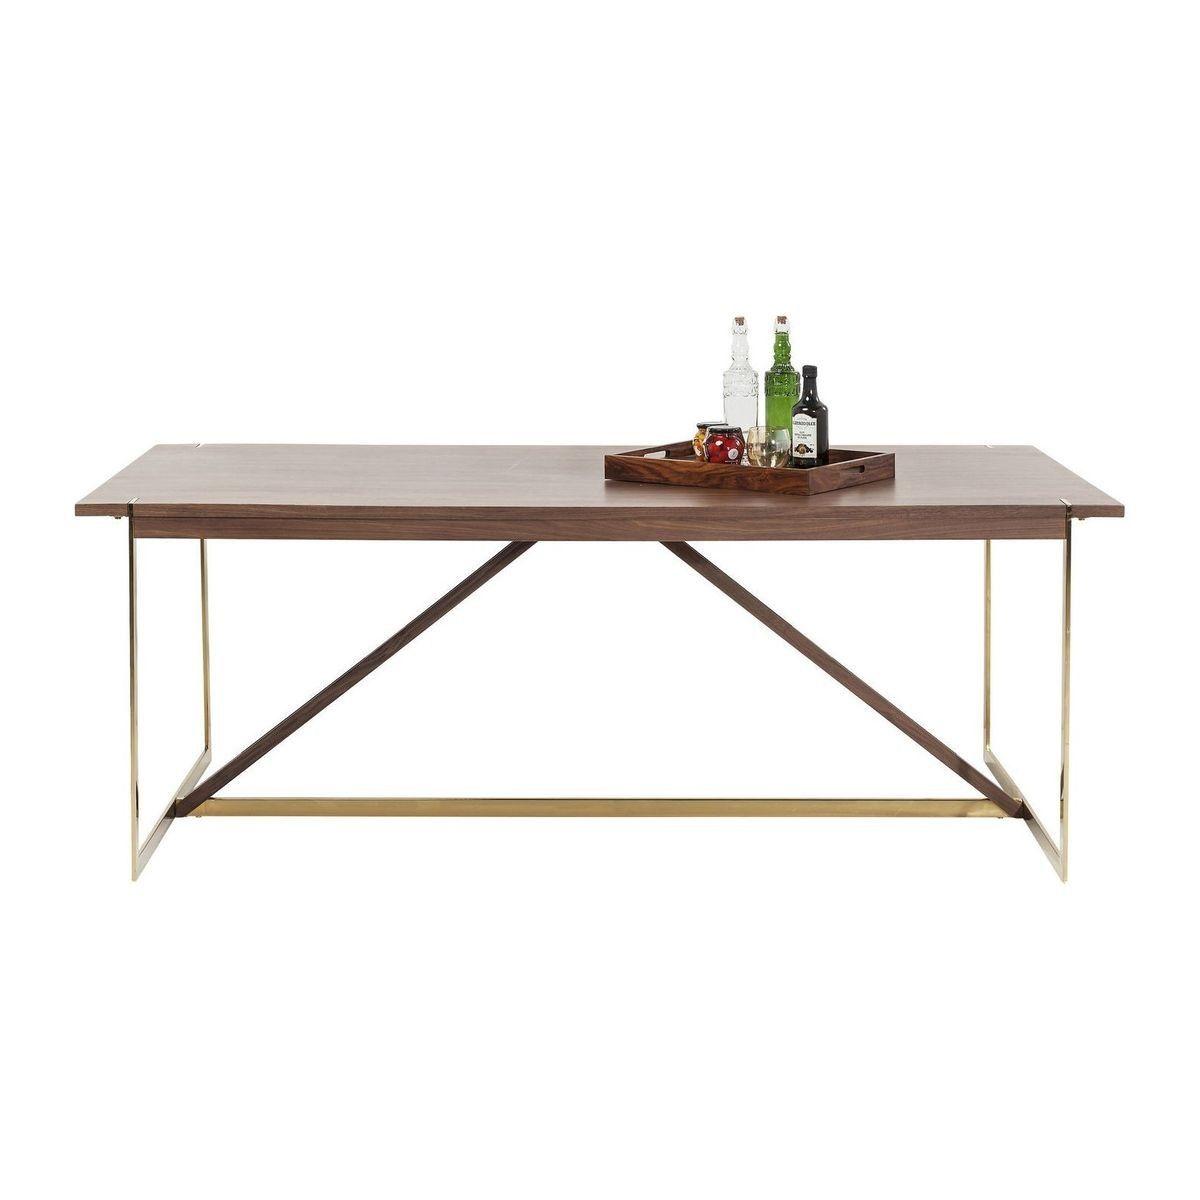 Table Montana 200x100cm Kare Design Kare Design Prix Avis Amp Notation Livraison La Table Mo Table A Manger Moderne Table Design Salle A Manger Cuisine